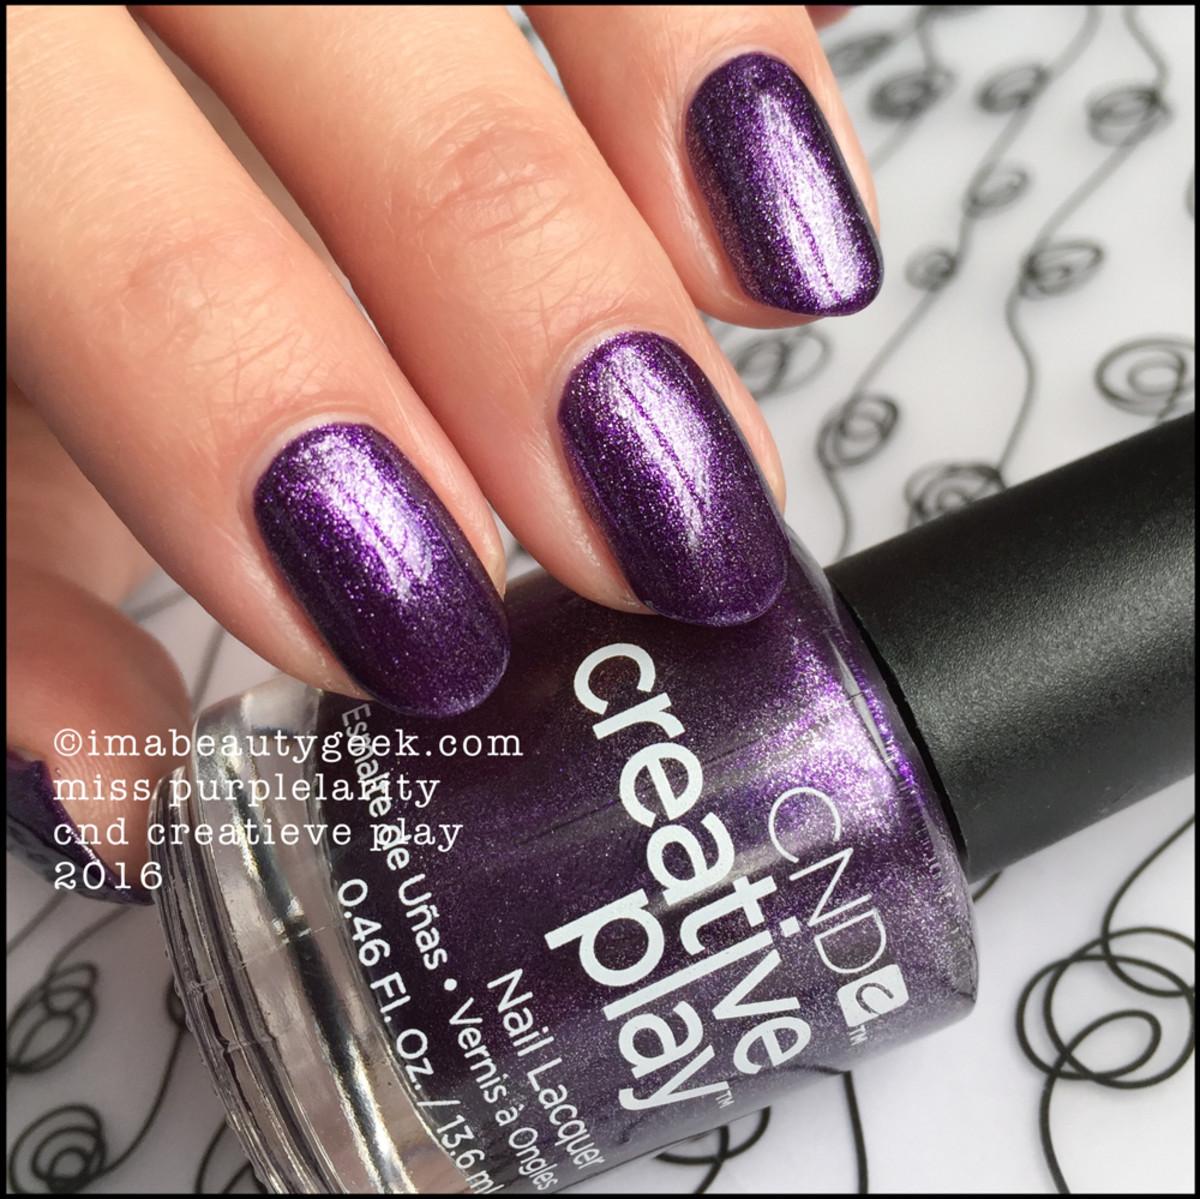 CND Creative Play Miss Purplelarity 2016